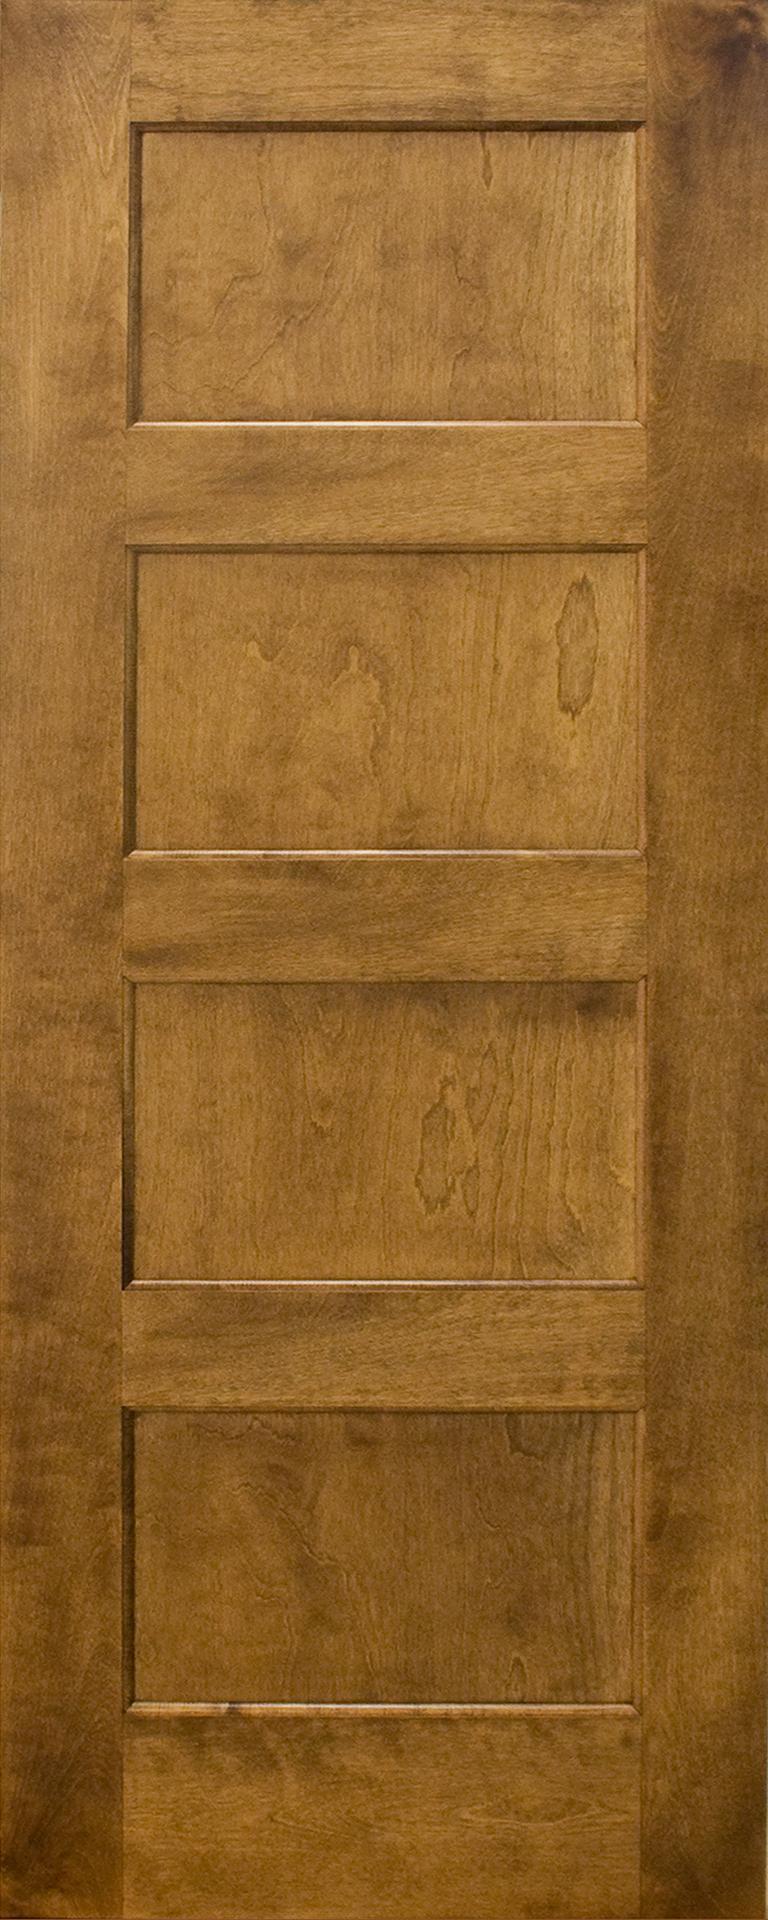 Doors Koch And Co